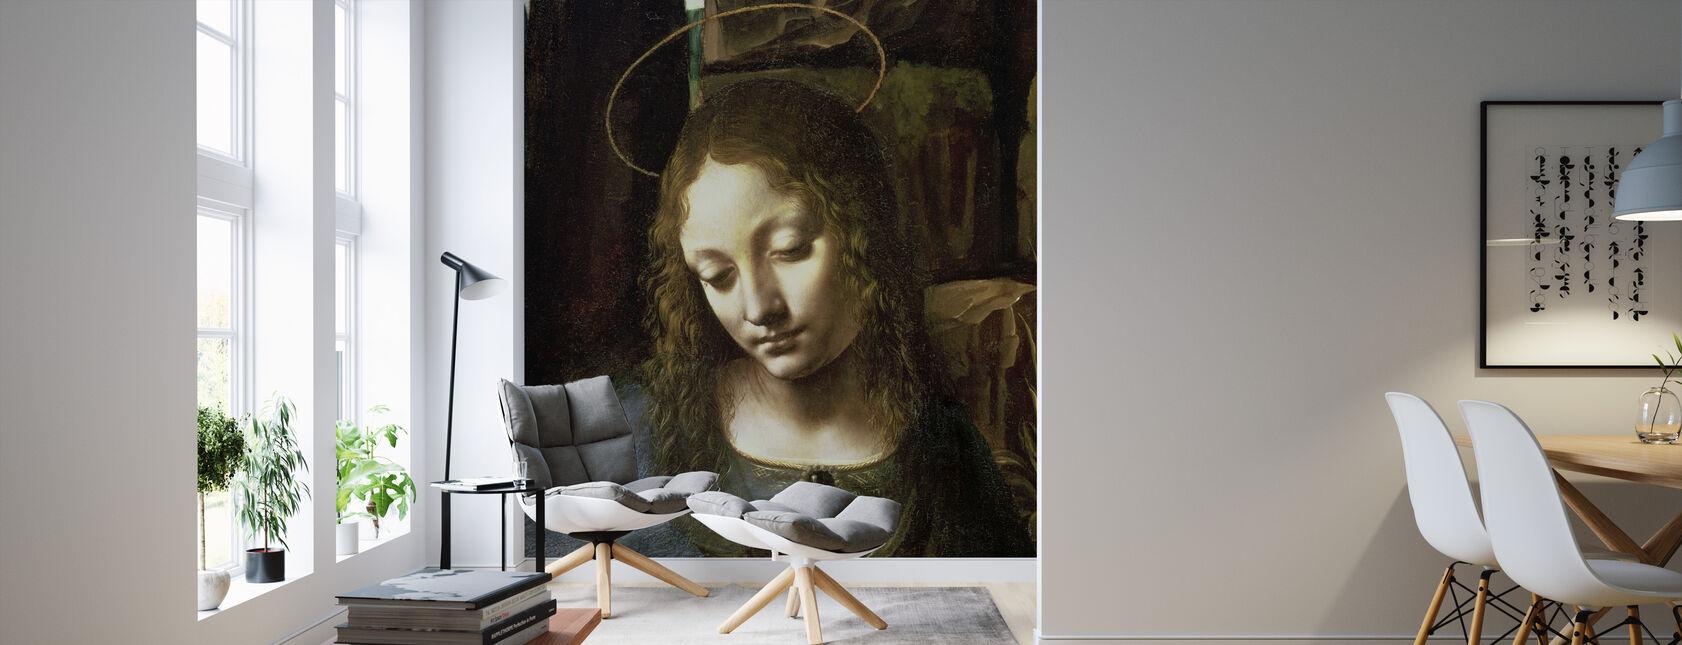 Virgin of the Rocks - Leonardo da Vinci - Wallpaper - Living Room